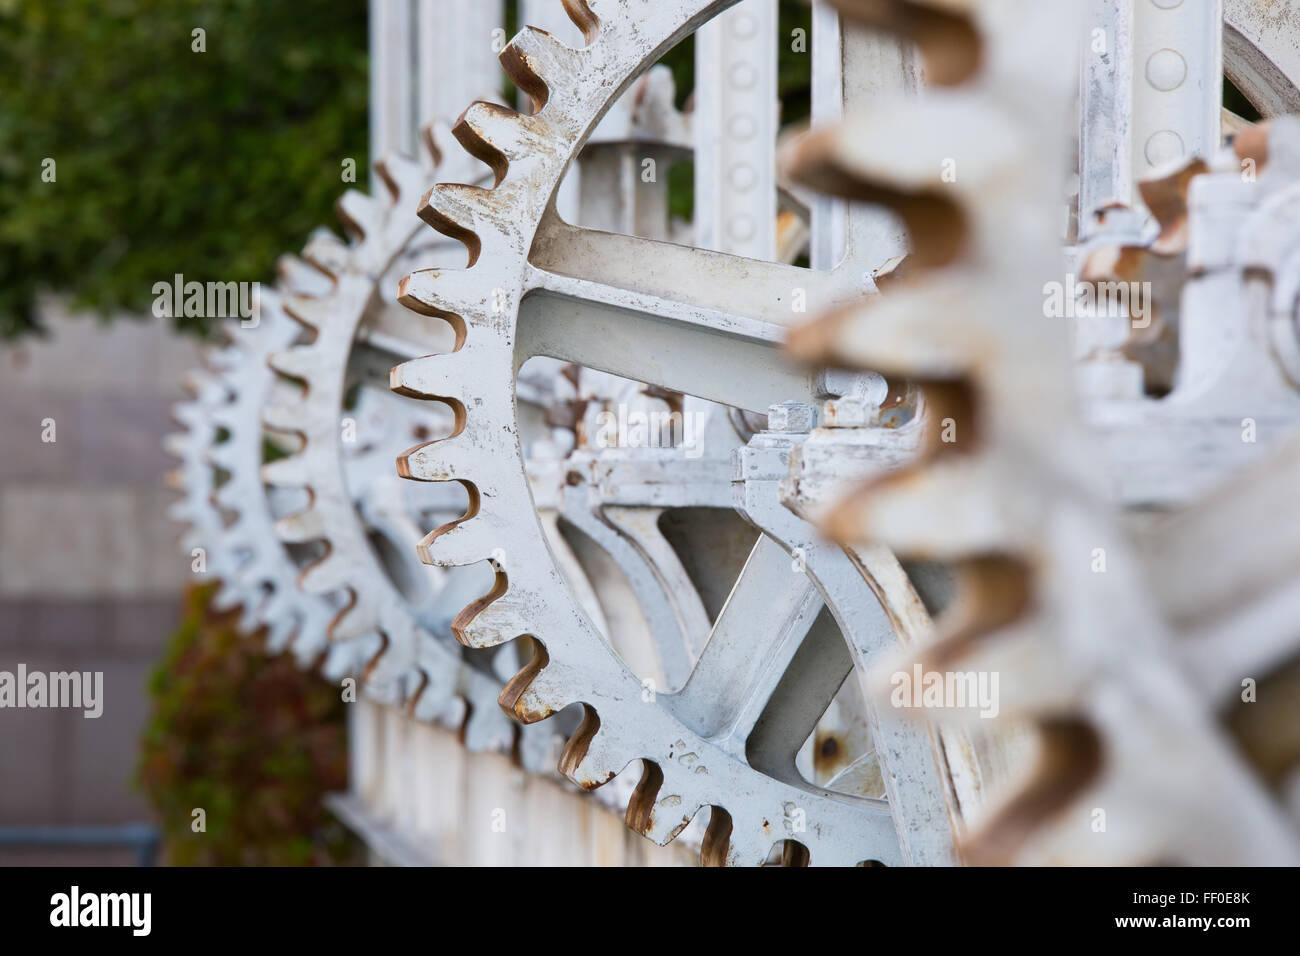 Close-up of the cog wheels at Geneva's 'Pont de la machine', Switzerland. - Stock Image